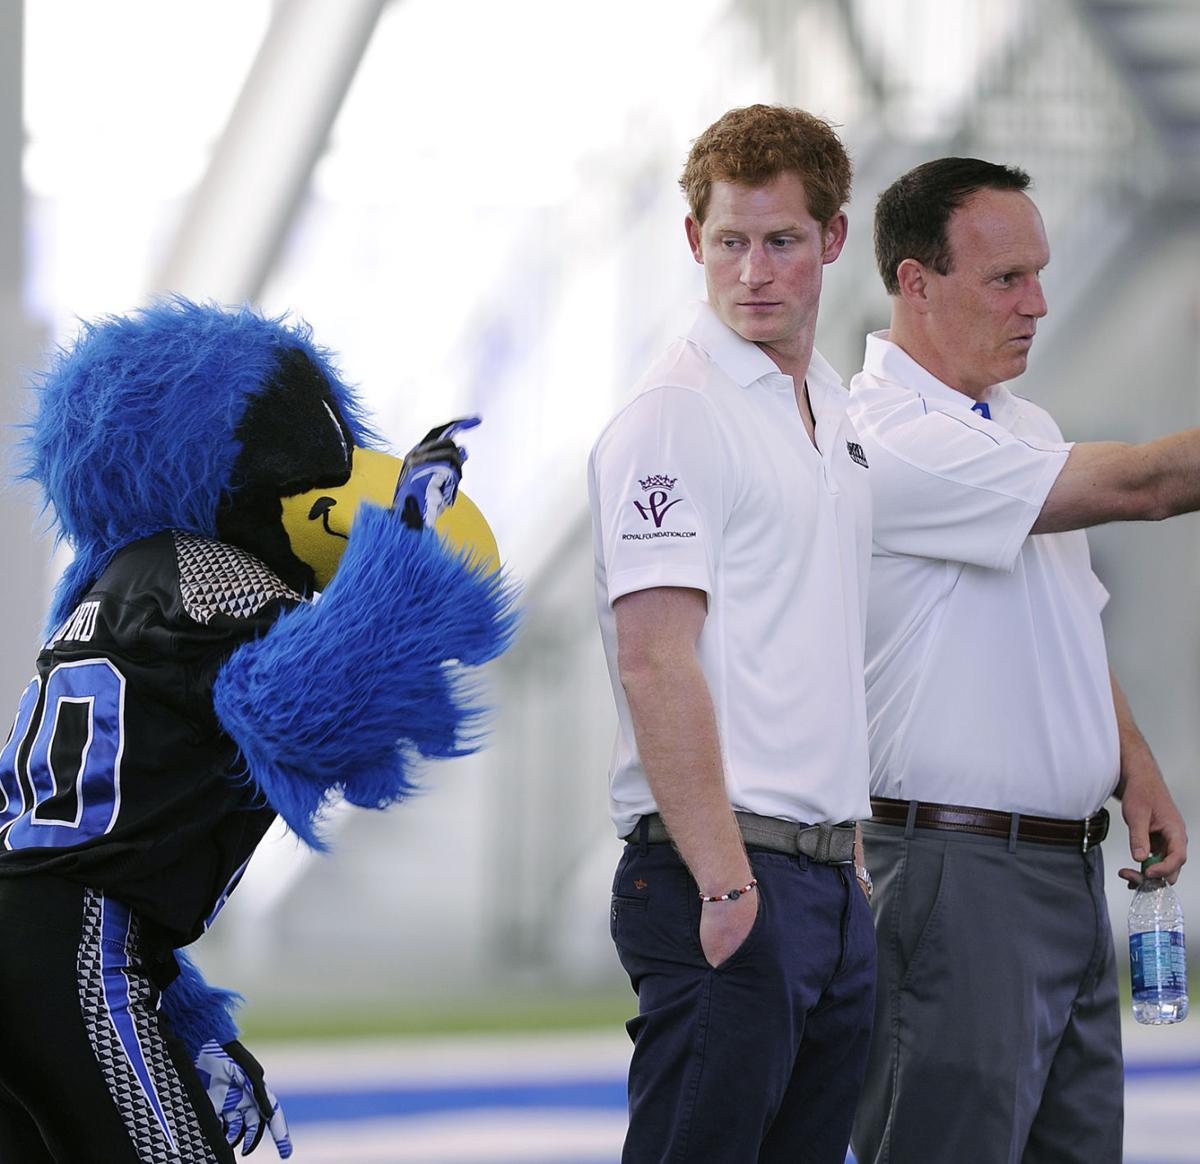 Prince Harry gets football tips from Air Force coach Troy Calhoun